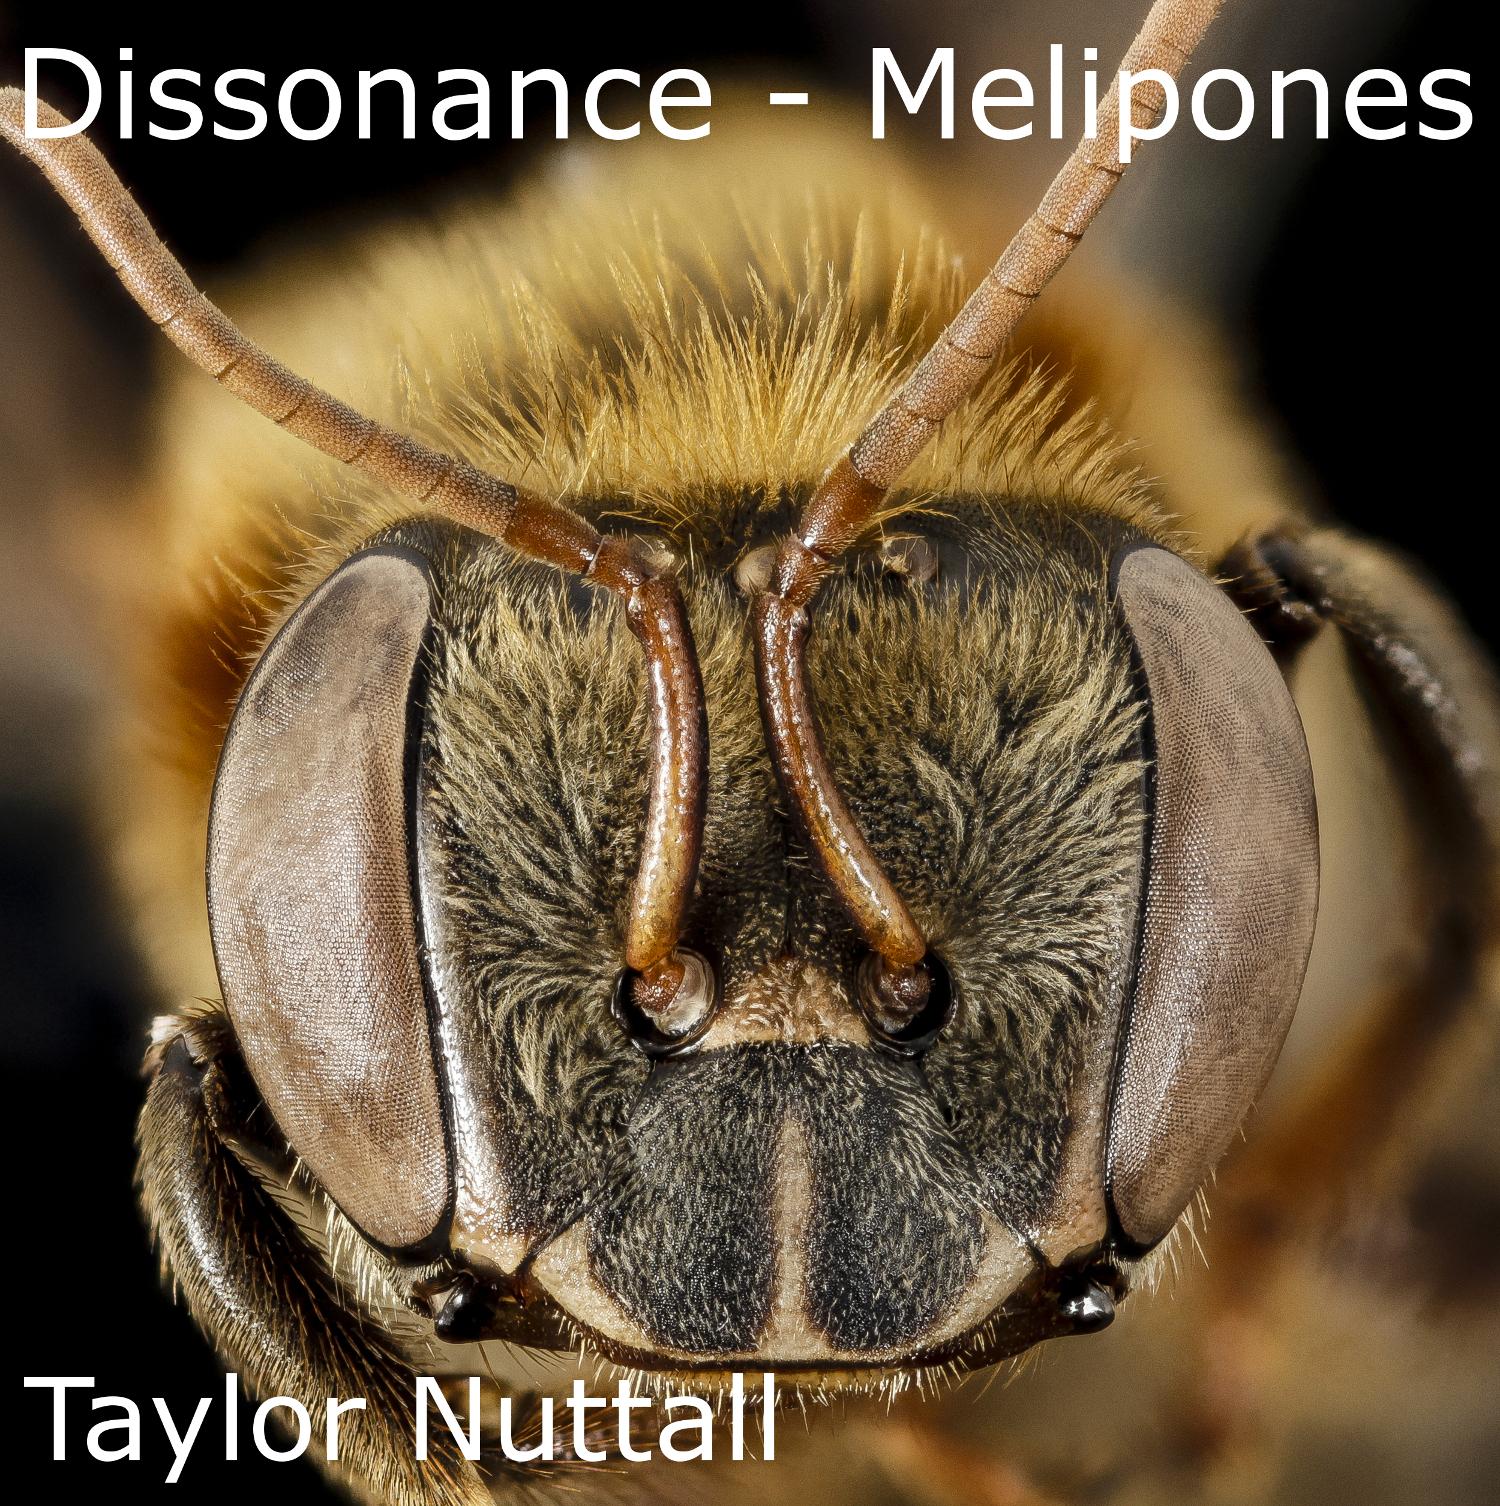 Dissonance - Melipones track art